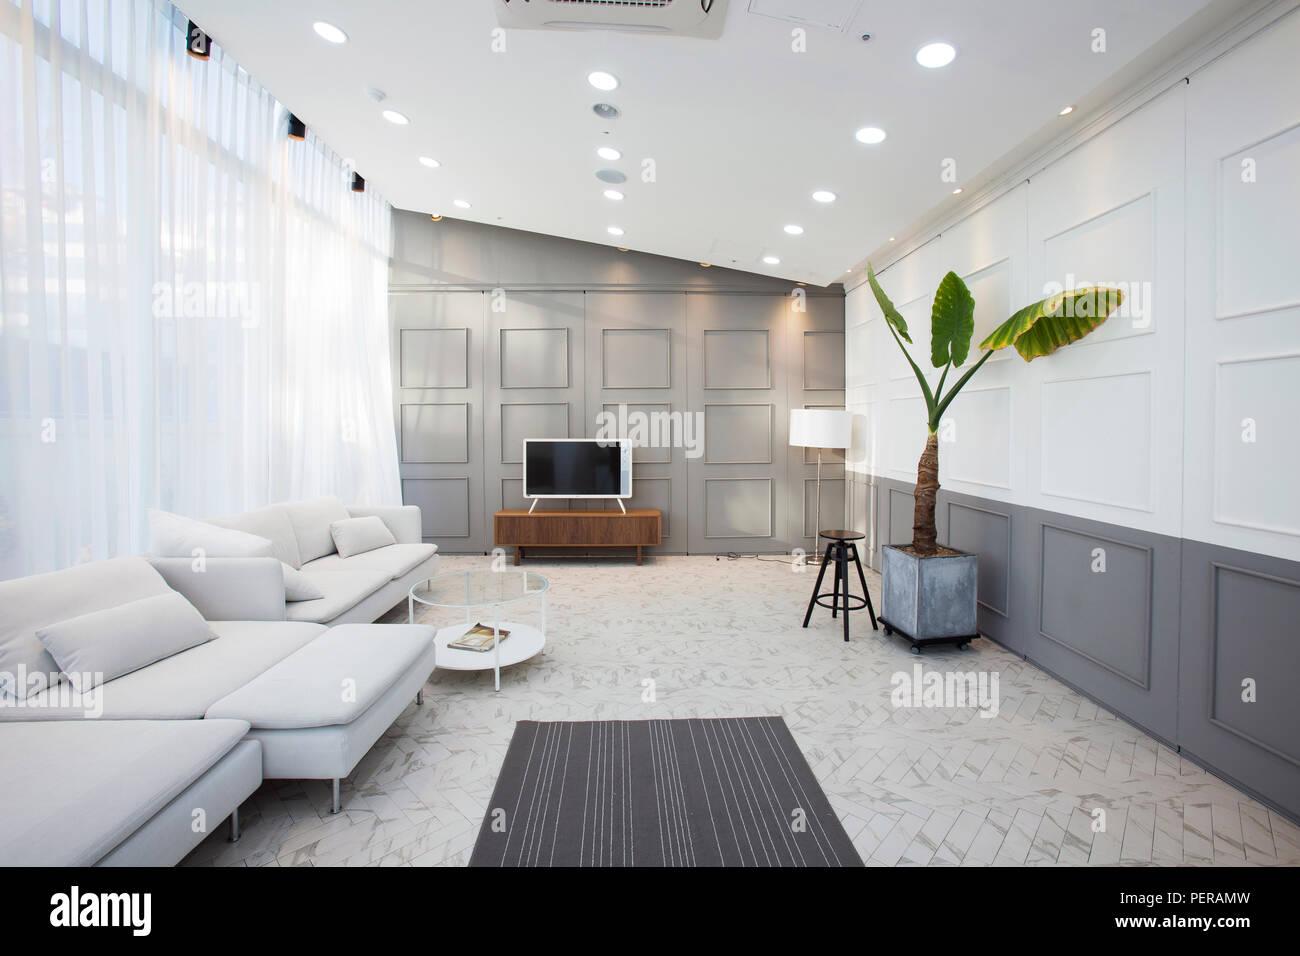 Modern space interiors design stock photo. living room, office